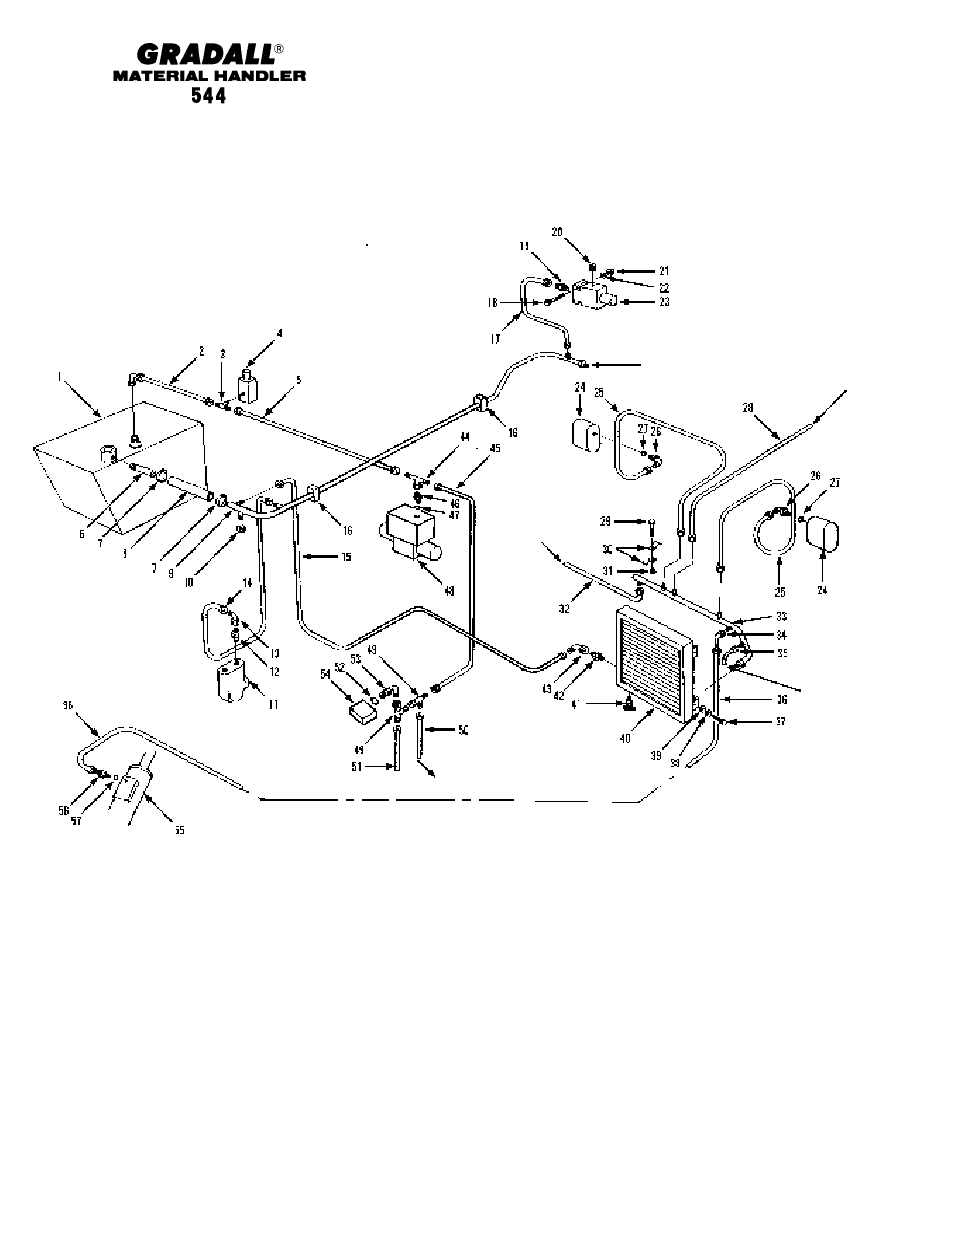 Hydraulic Circuits Dump Circuit Gradall 544 User Manual Page 113 System Diagram Serial Numbers 209